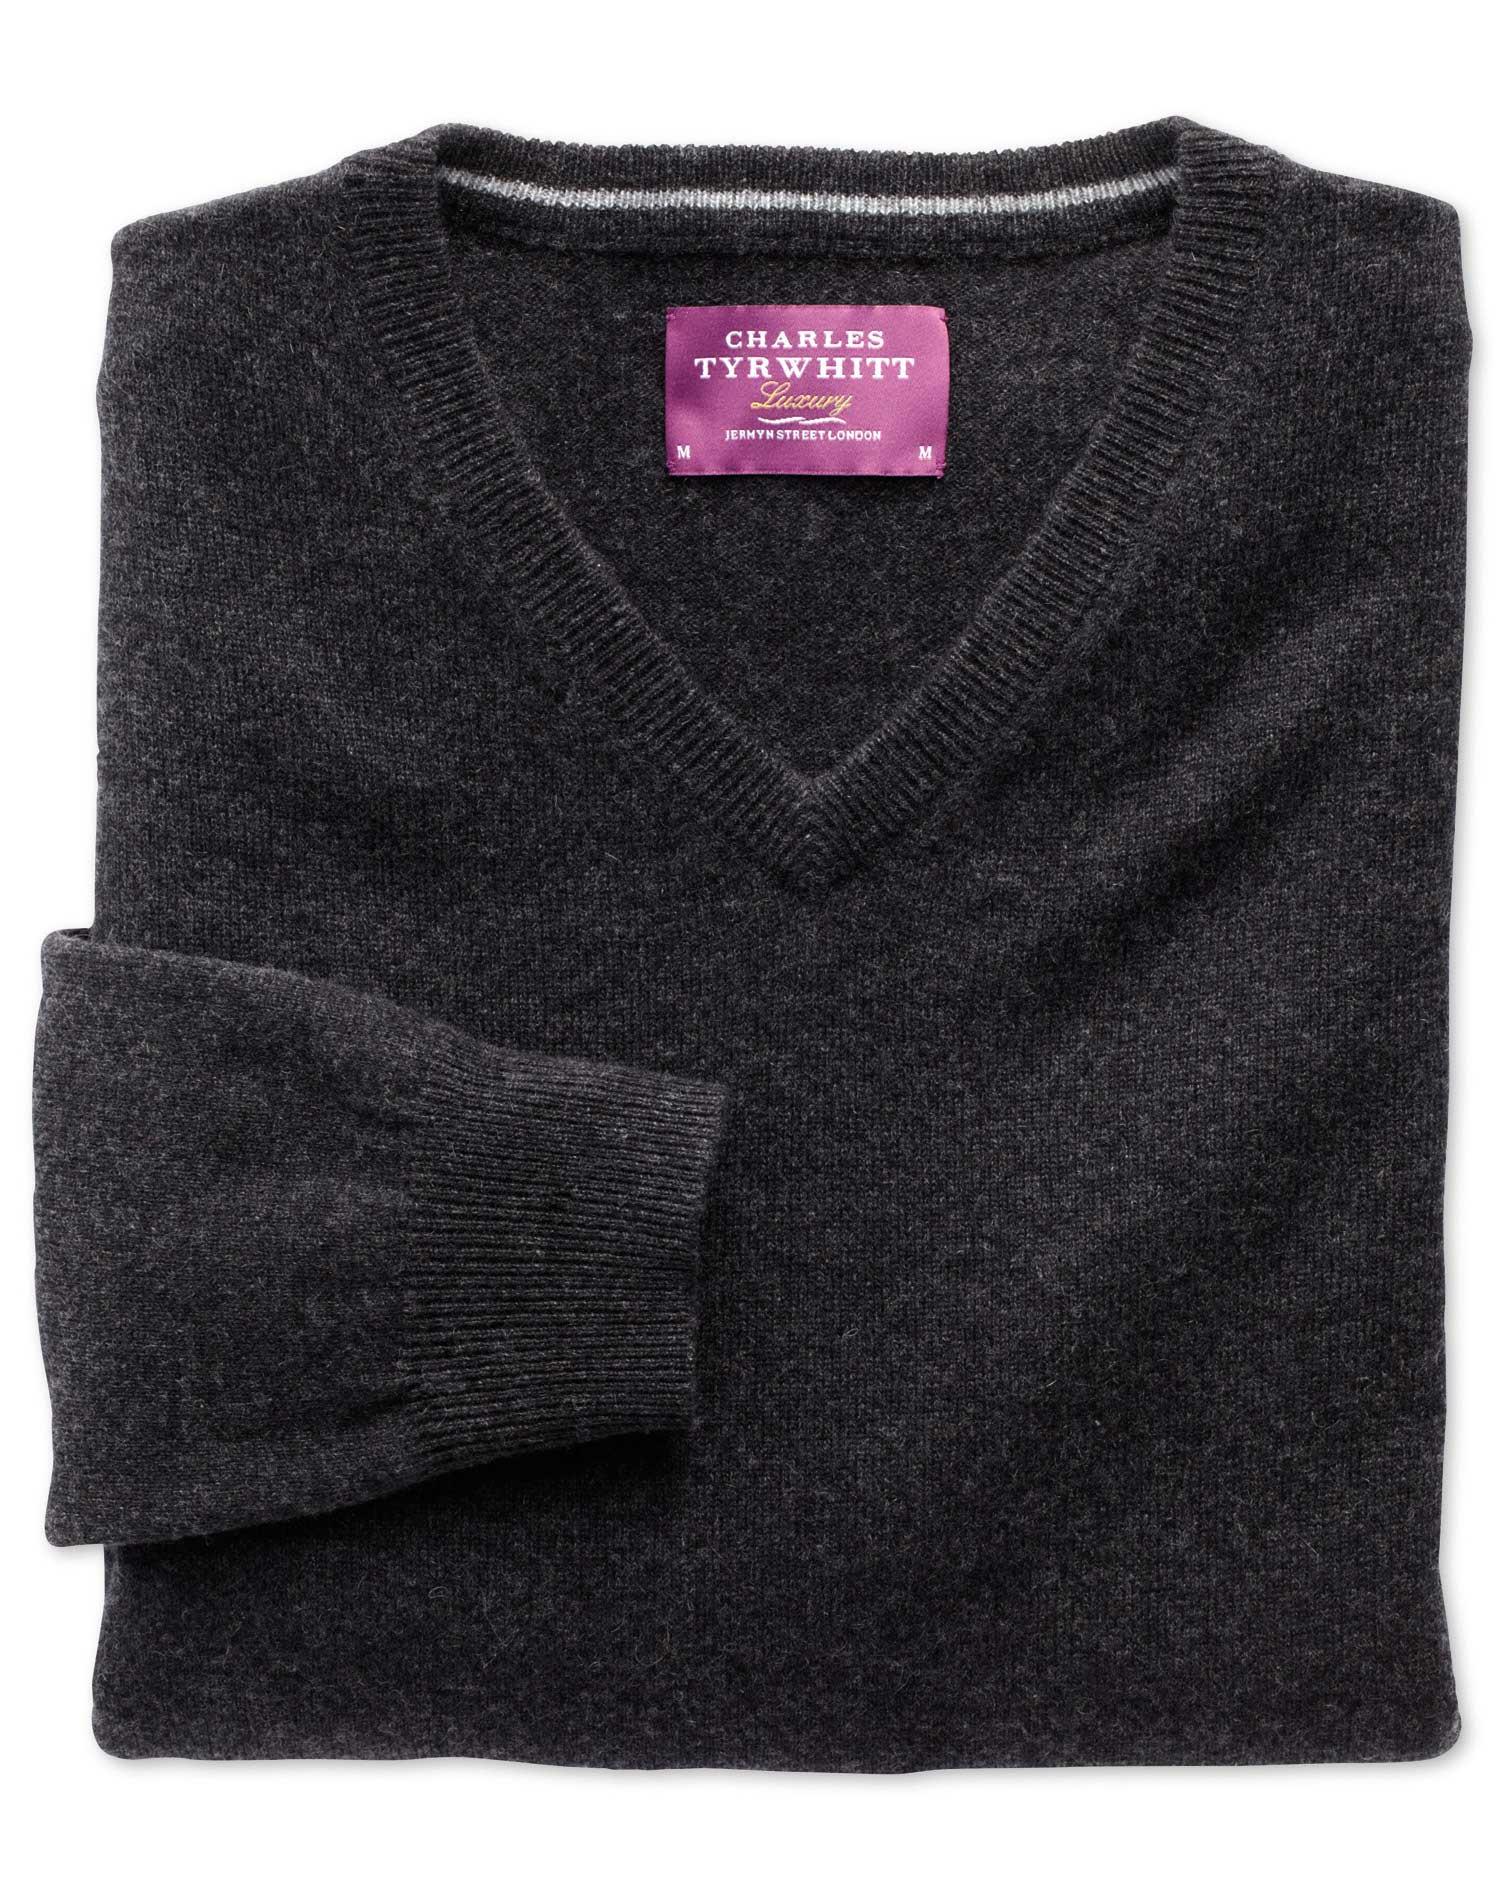 Charcoal Cashmere V-Neck Jumper Size Medium by Charles Tyrwhitt